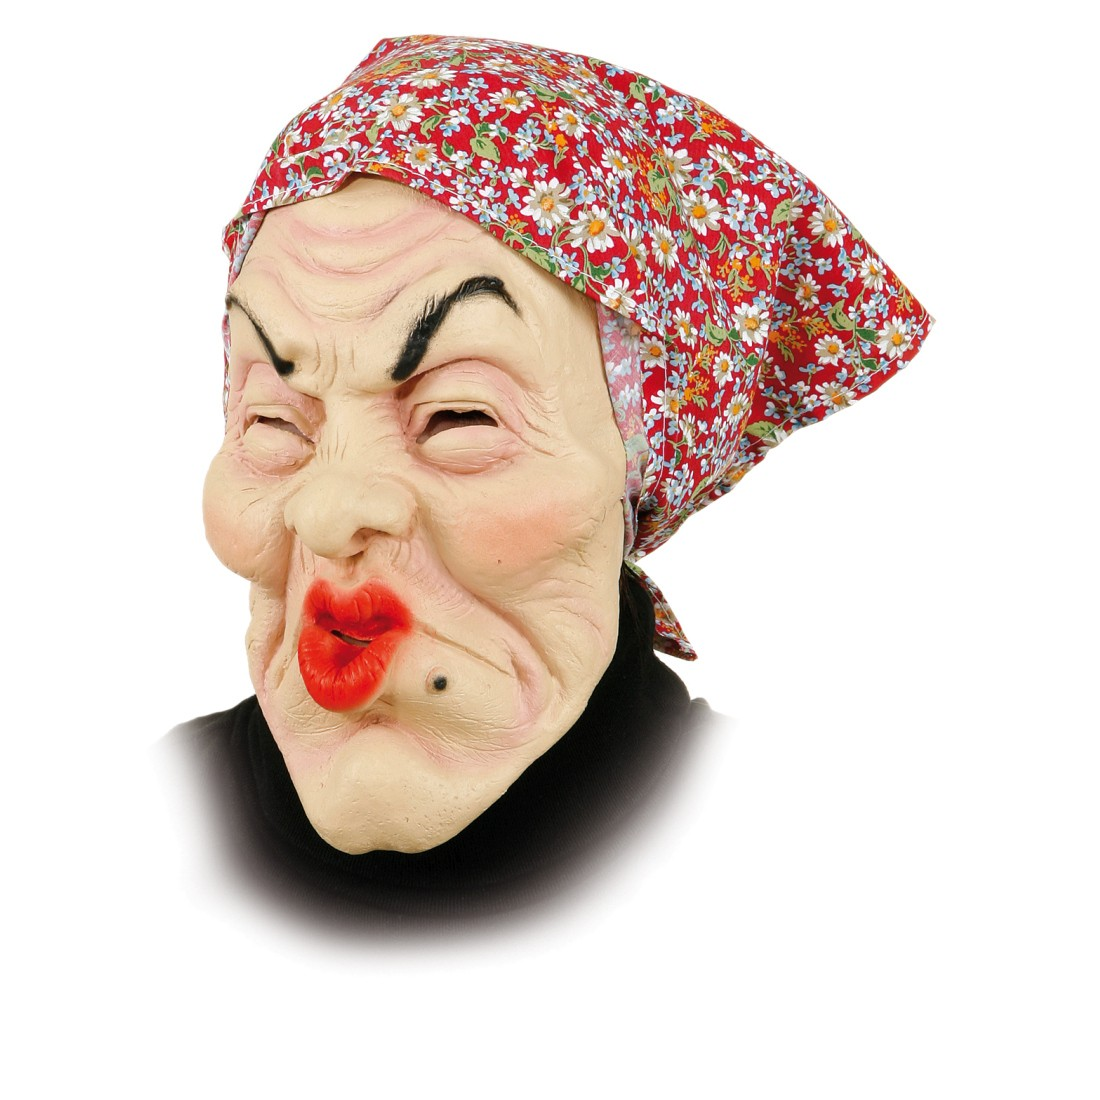 Gummi Maske Oma Masken Fur Fasching Karnevalsmasken 9 99